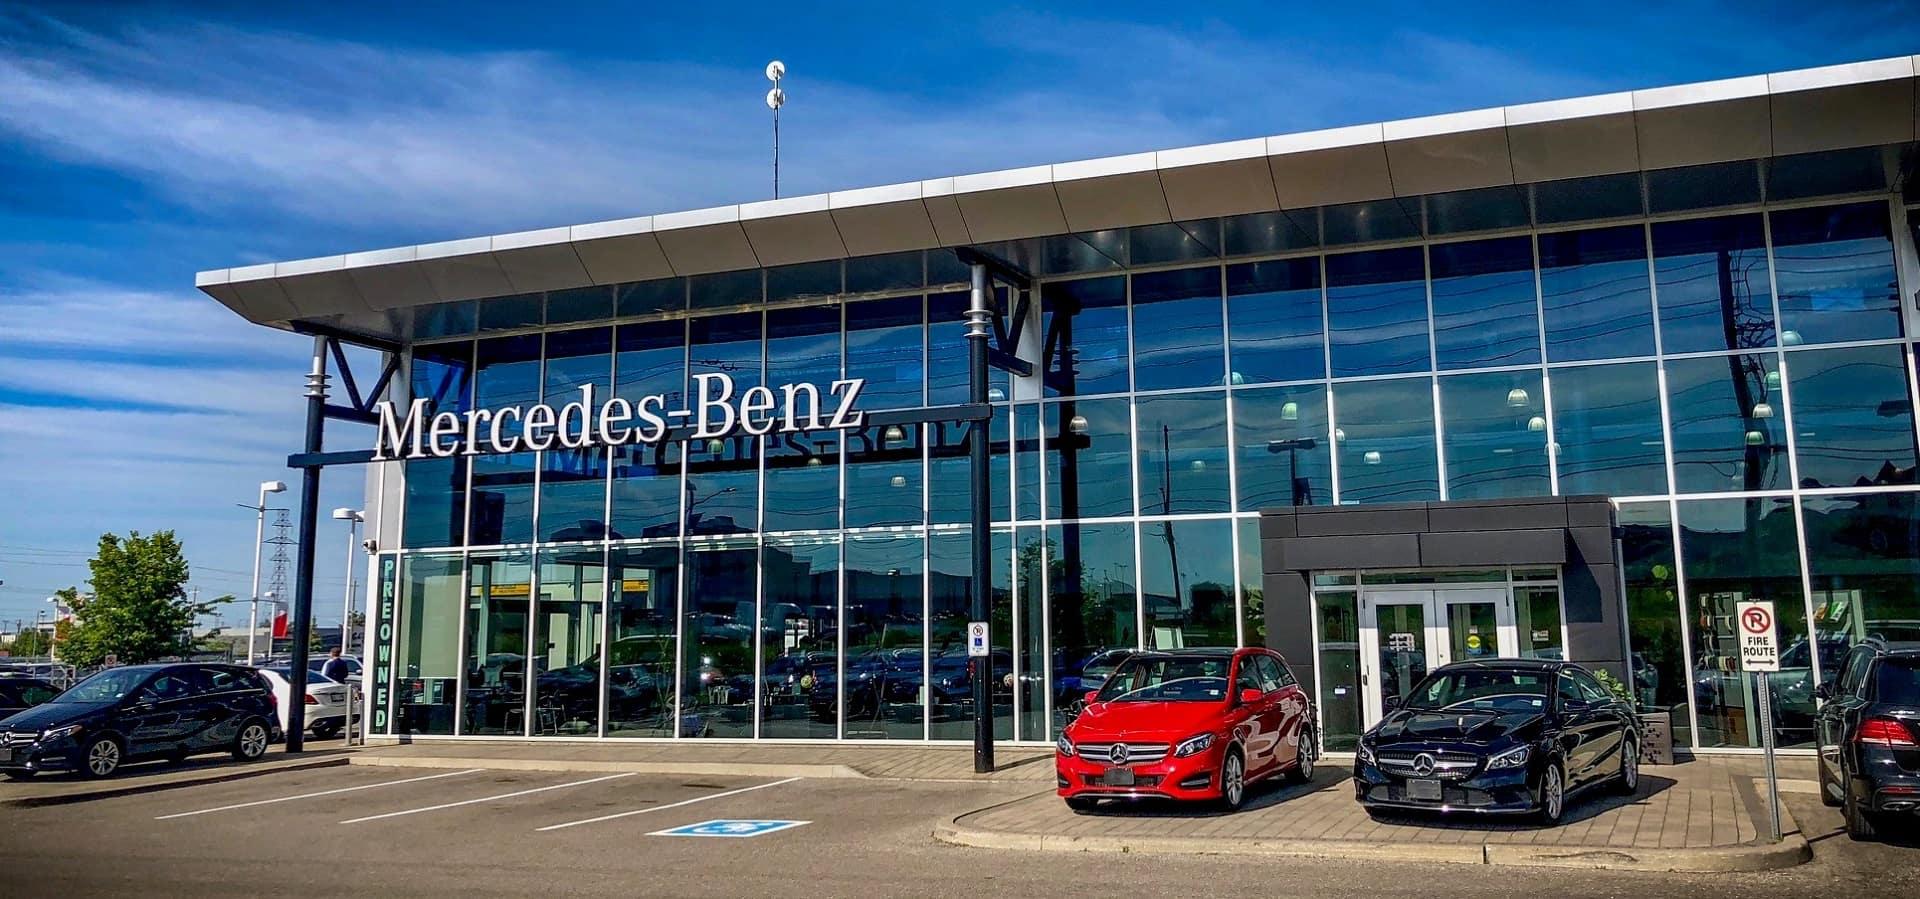 Mercedes Benz Dealers >> Mercedes Benz Durham Mercedes Benz Dealer In Whitby On